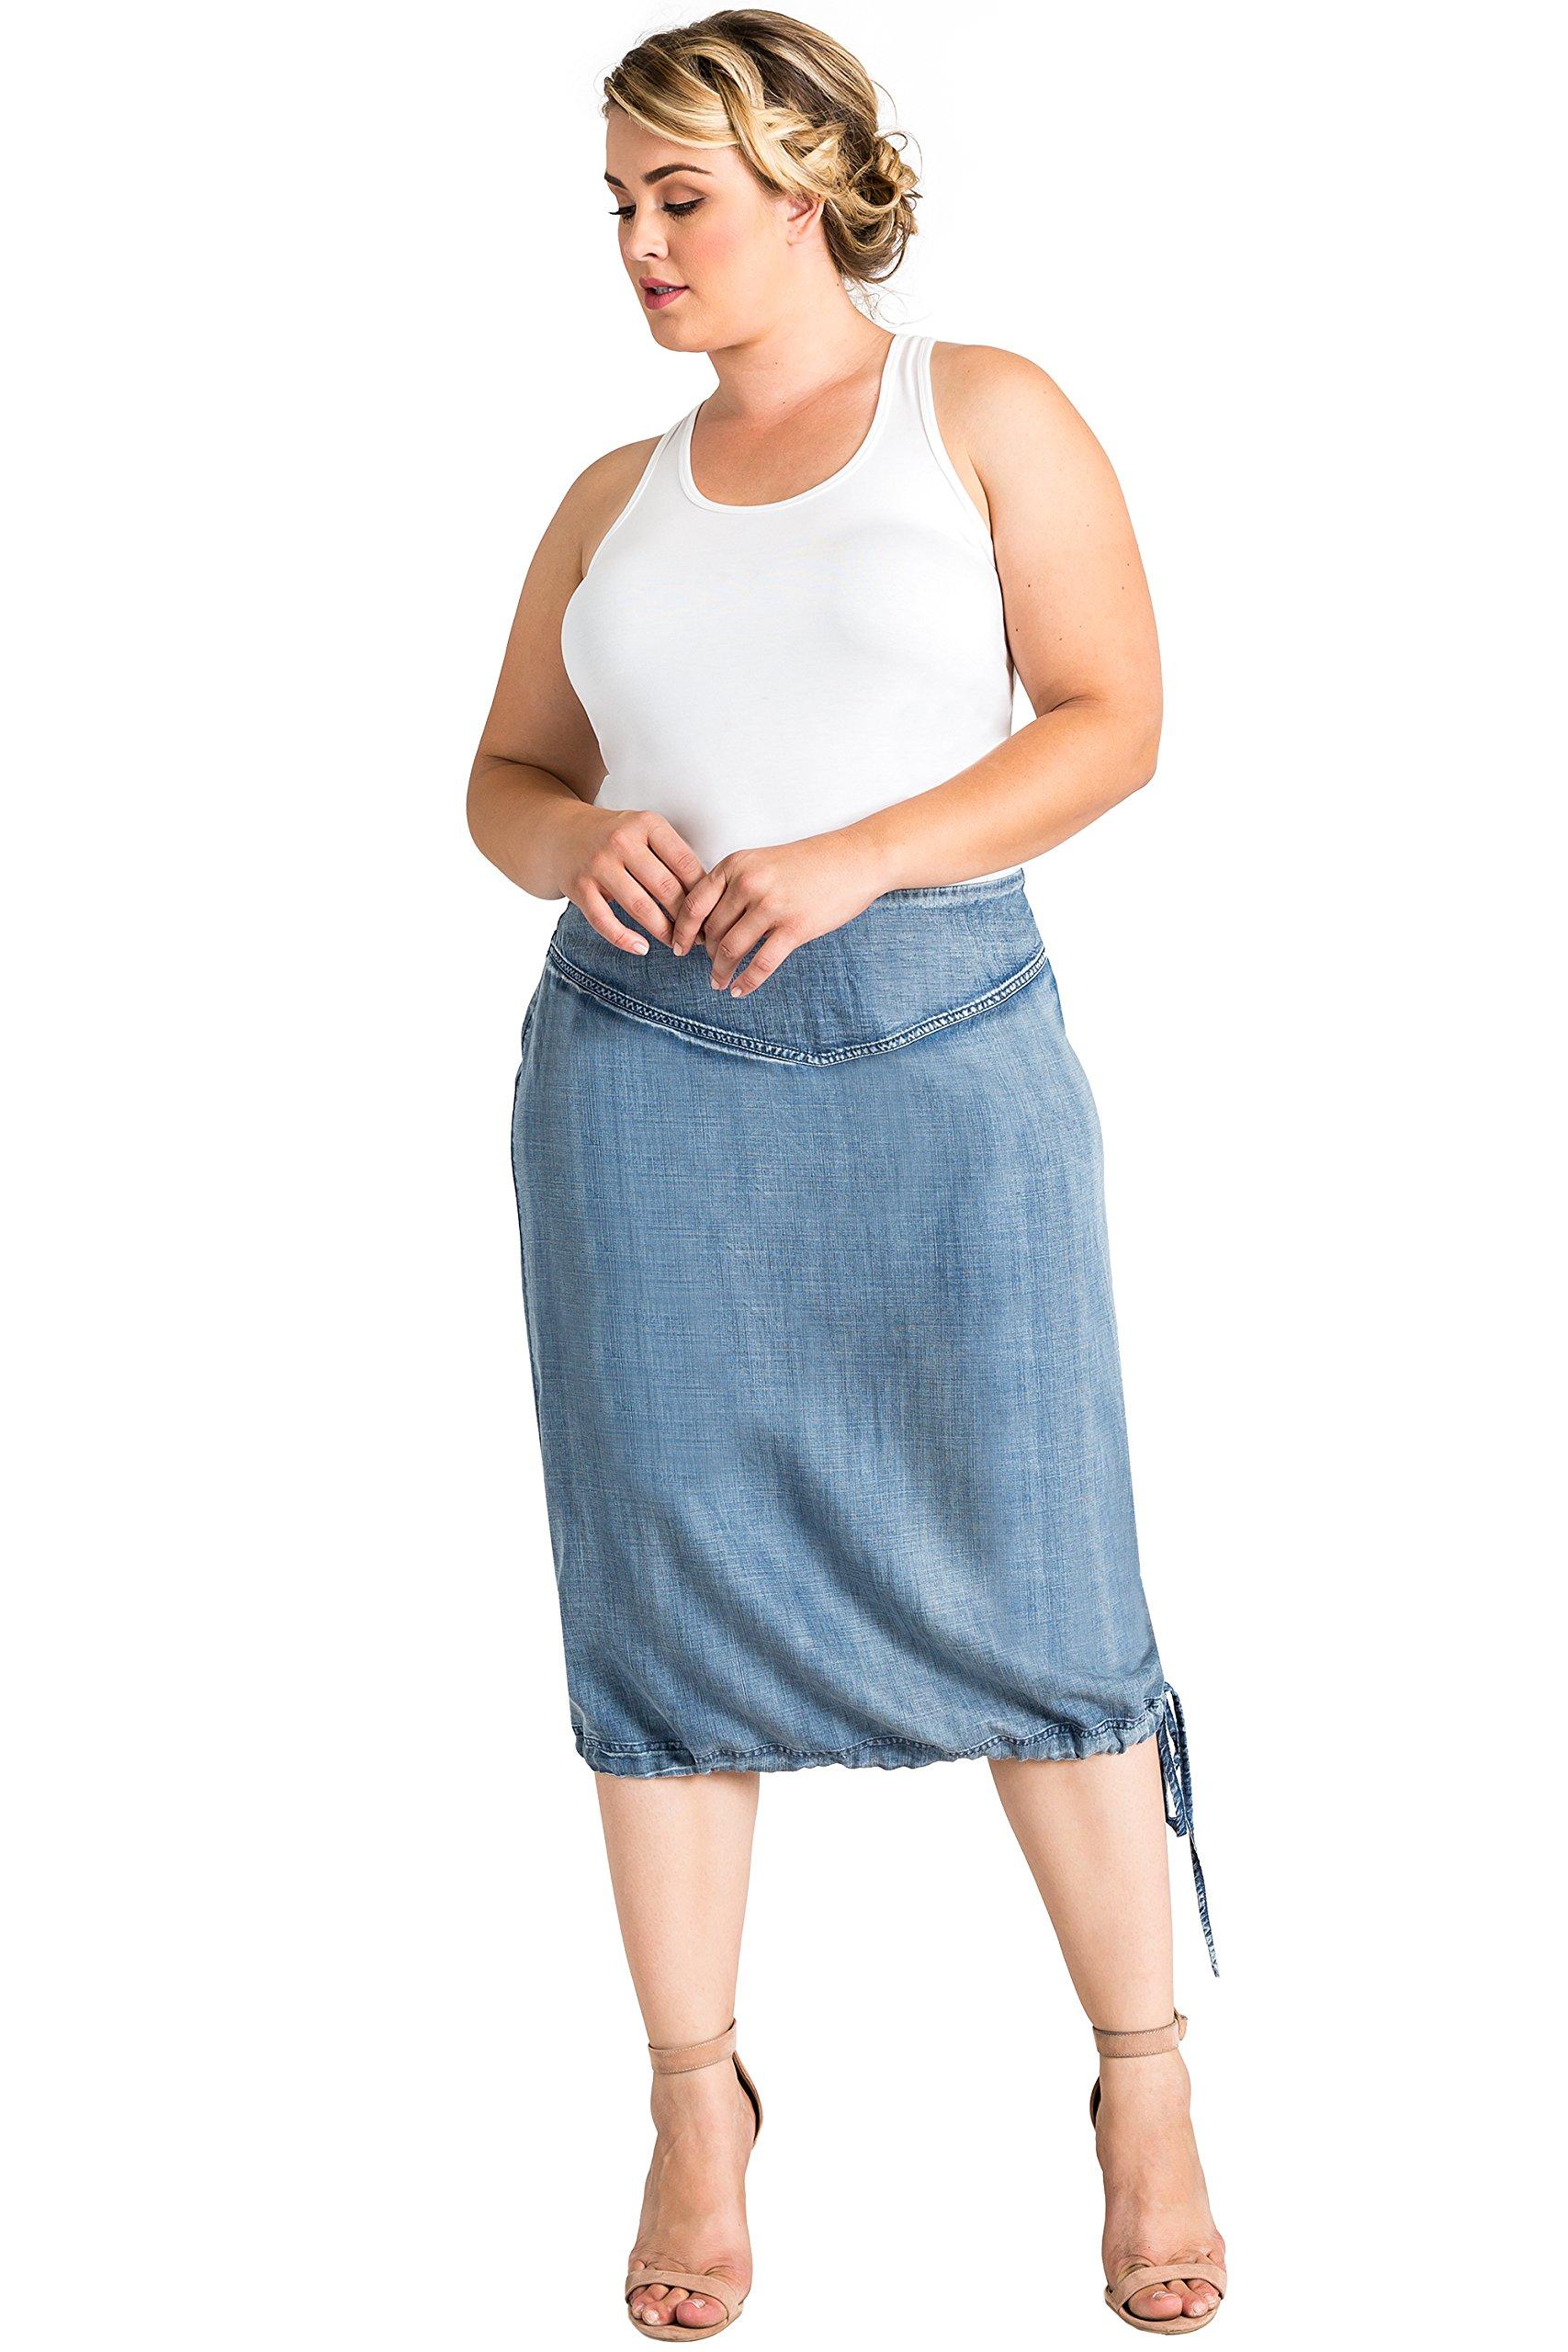 Standards & Practices Women's Plus Size Light Tencel Denim Adjustable Hem Skirt Size 3X